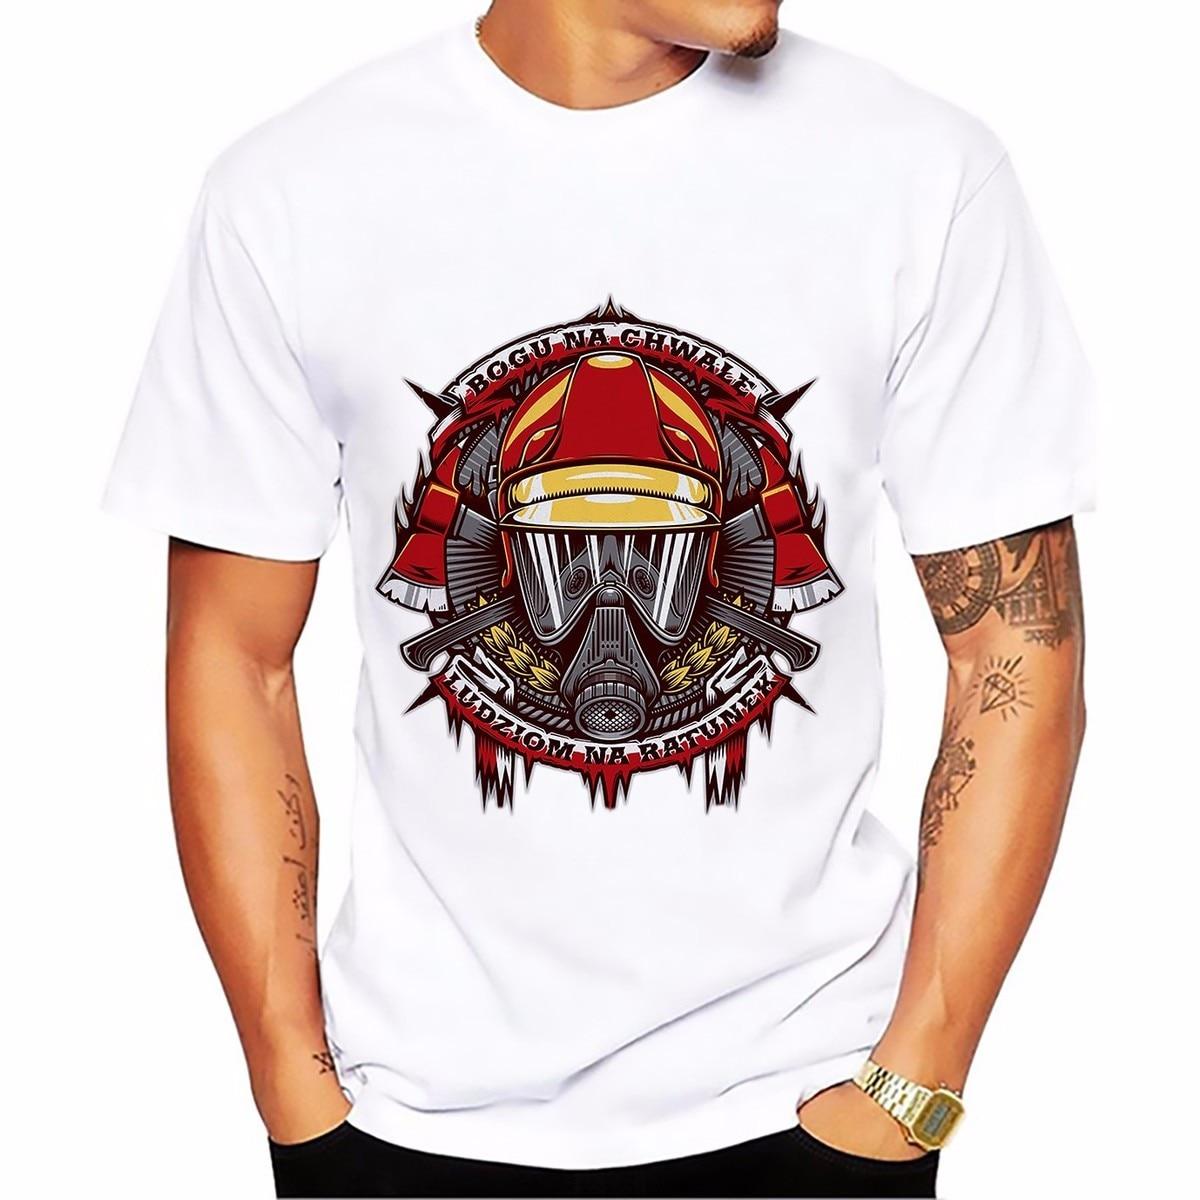 Anchor hook sign Fireman snake design t shirt Men 2018 new summer white short sleeve T-shirt homme casual tshirt no glue print